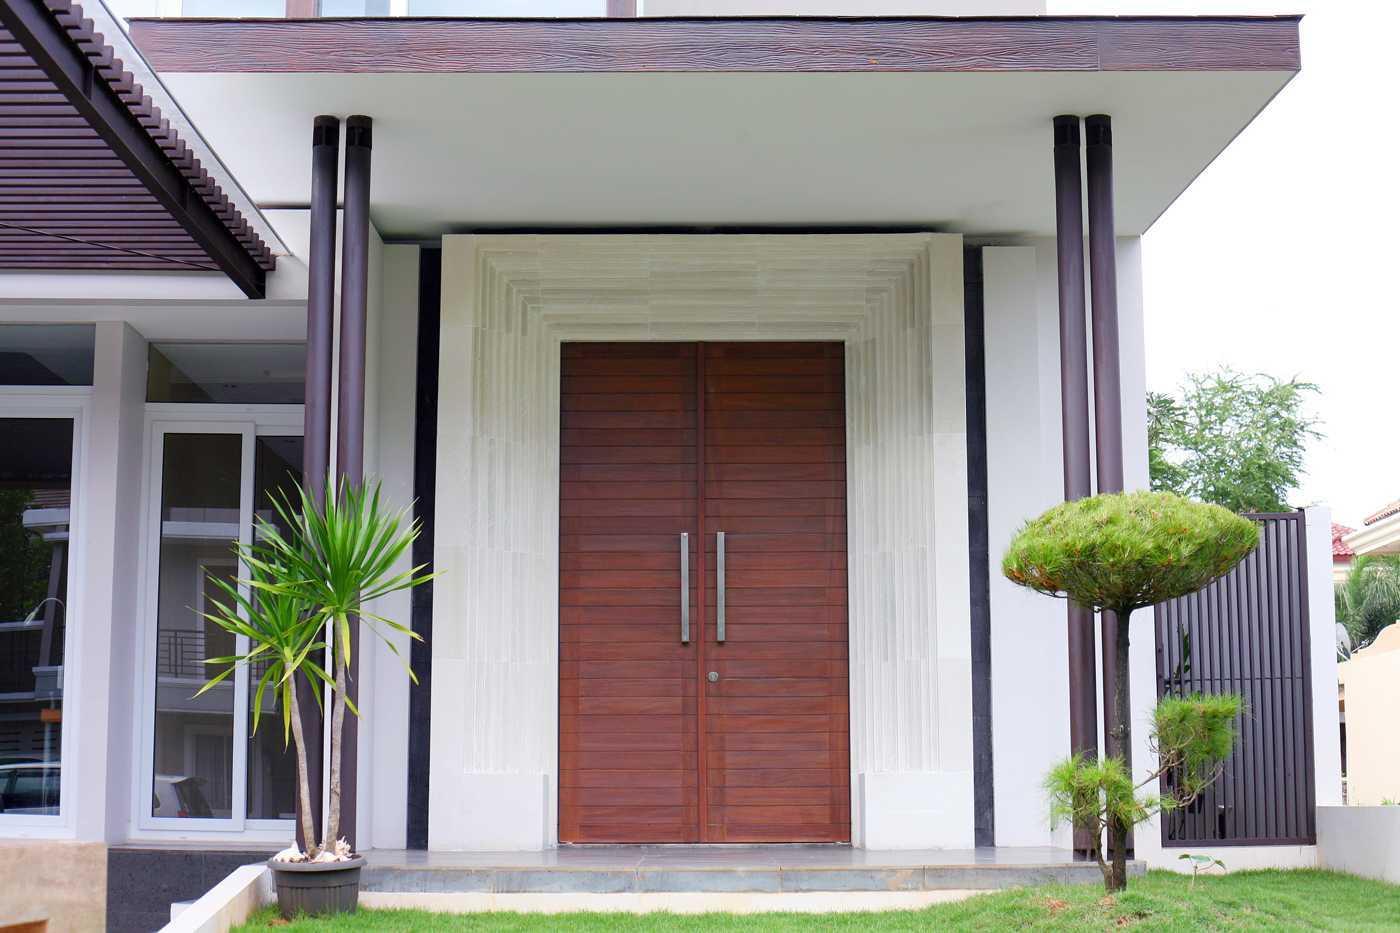 Foto inspirasi ide desain entrance tropis Img9863 oleh HerryJ Architects di Arsitag